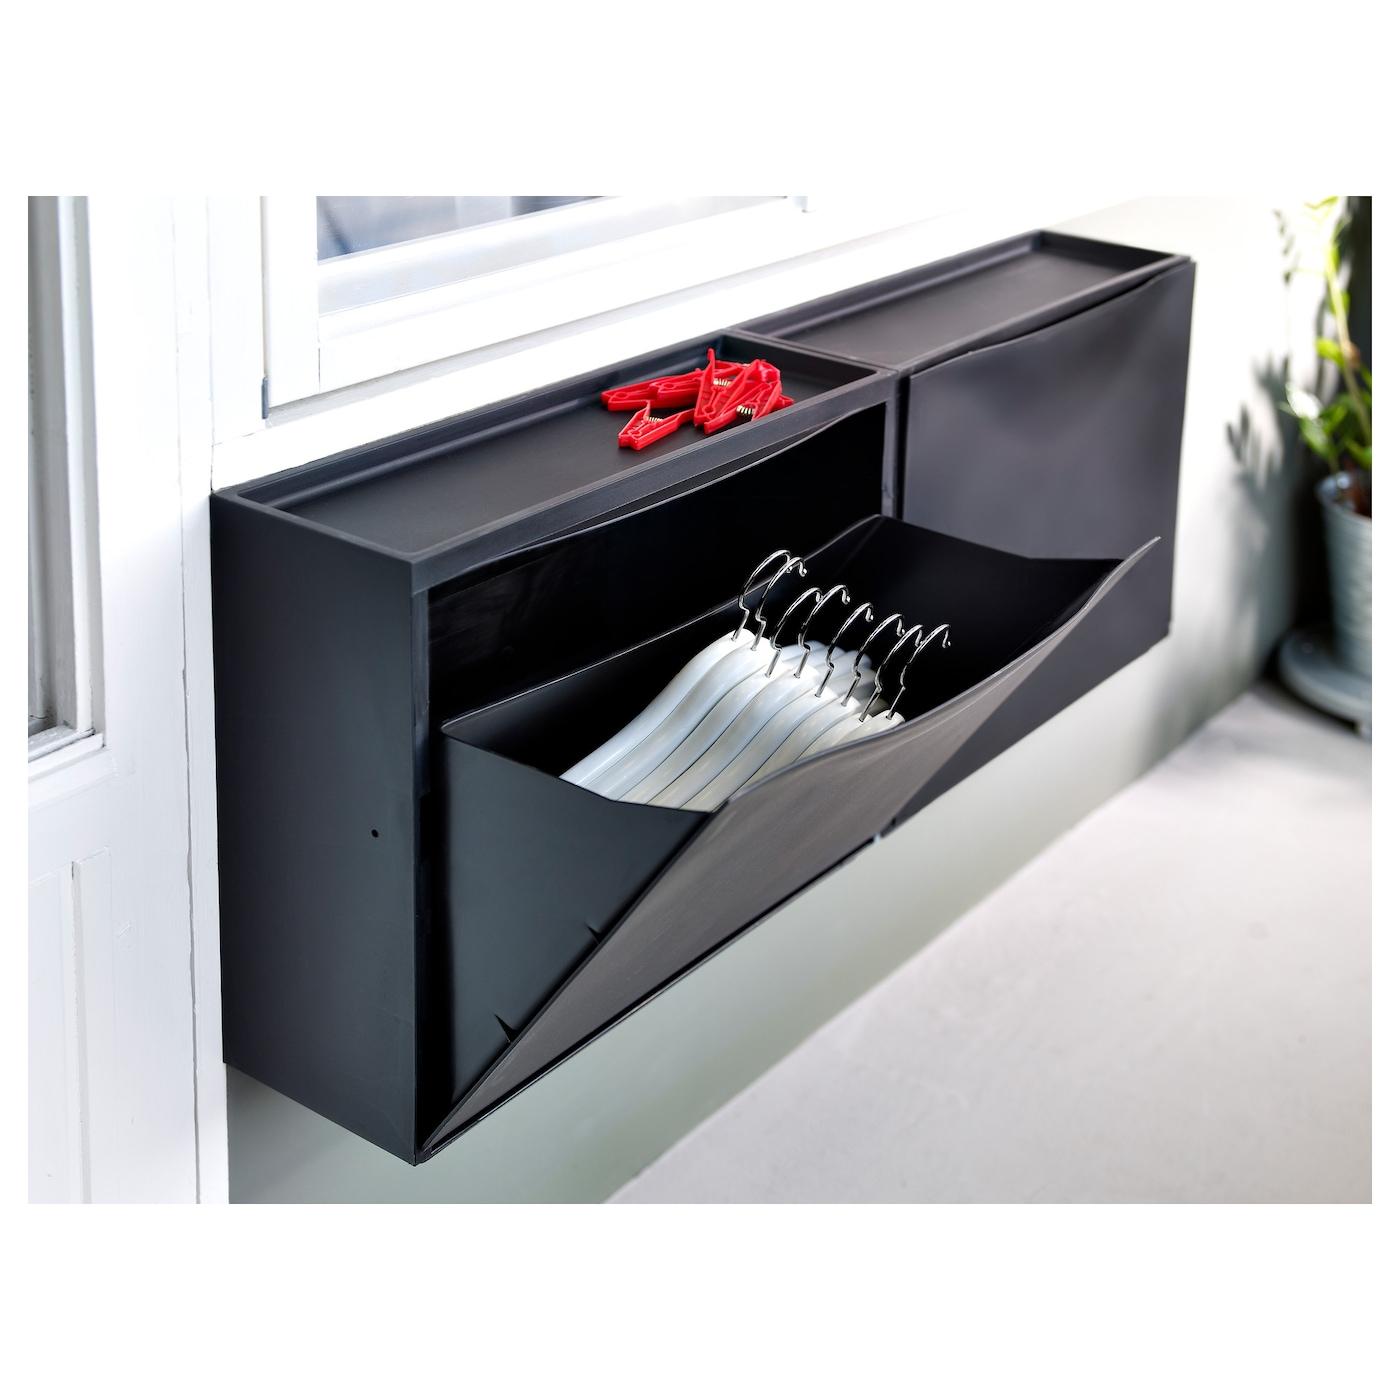 Trones armoire chaussures rangement noir 51x39 cm ikea - Rangement armoire ikea ...